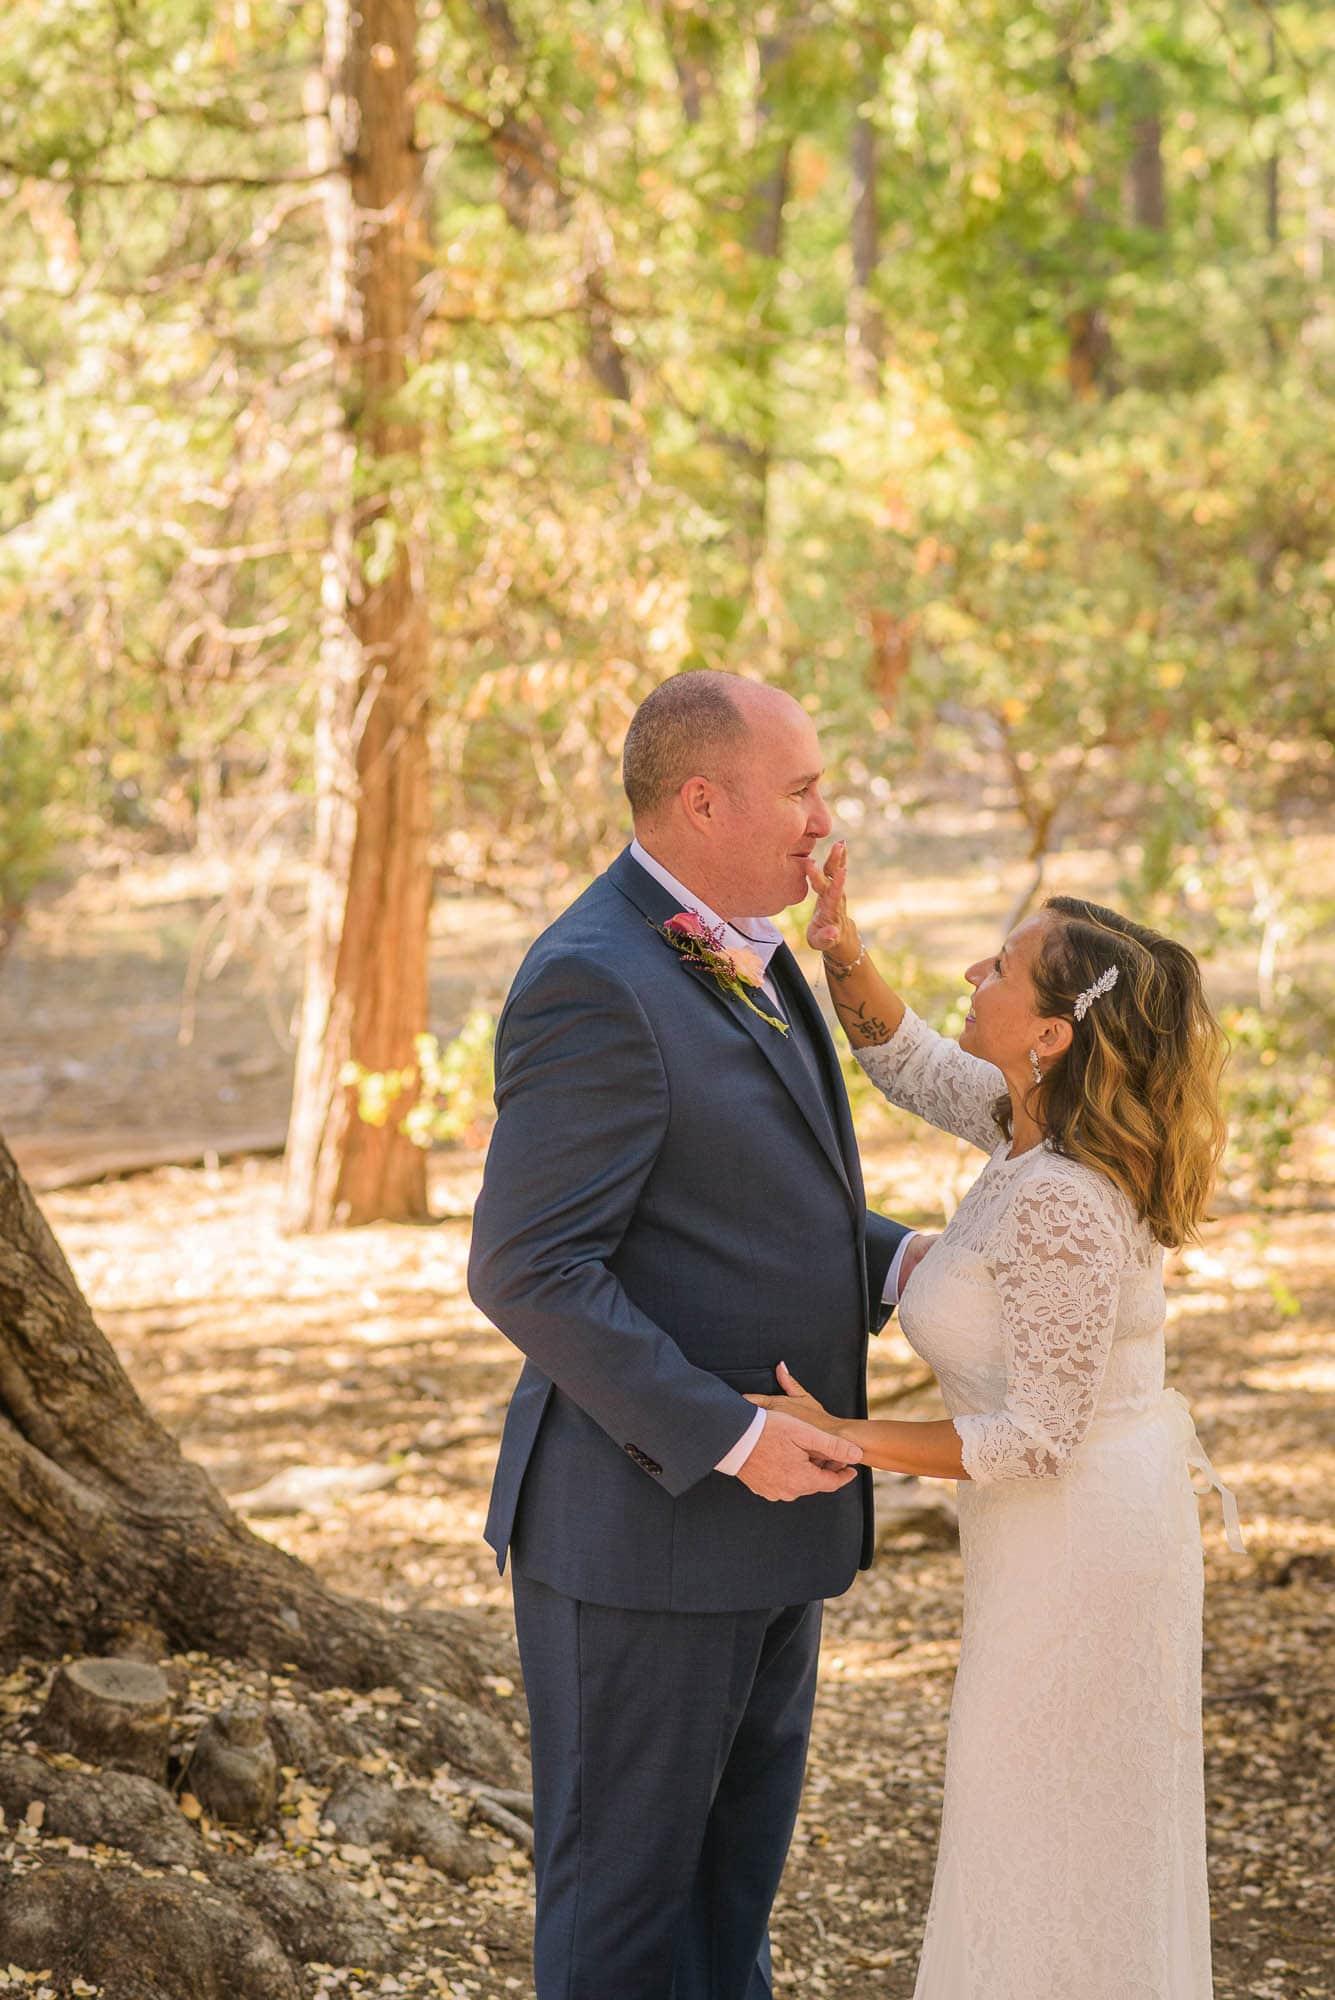 022_Alan_and_Heidi_Wedding_Jackie_Dannon